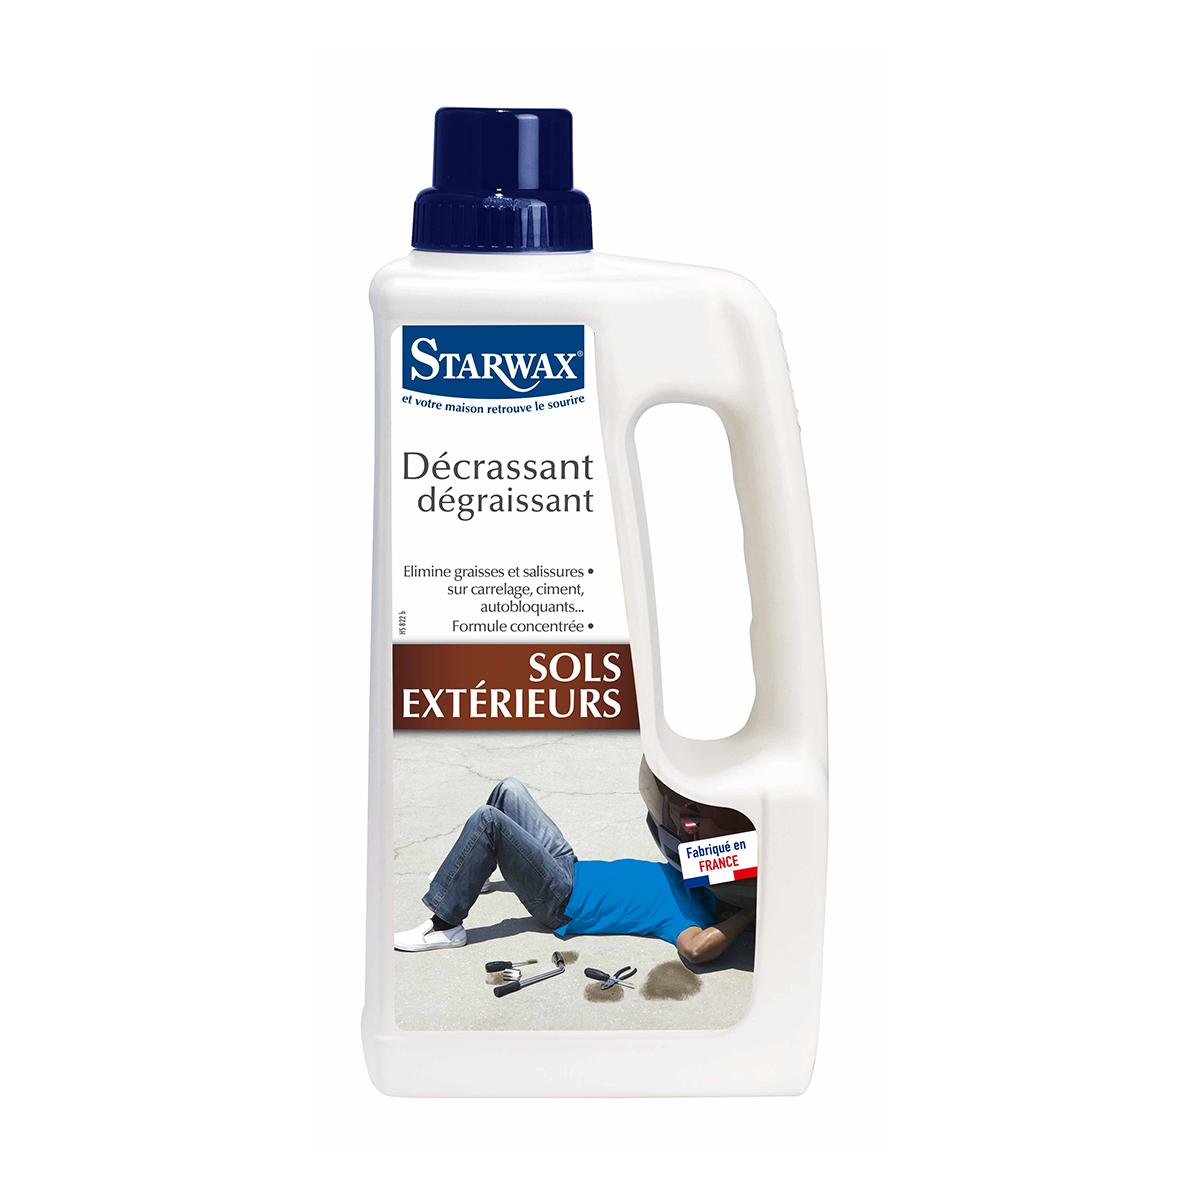 Patio cleaner - Starwax